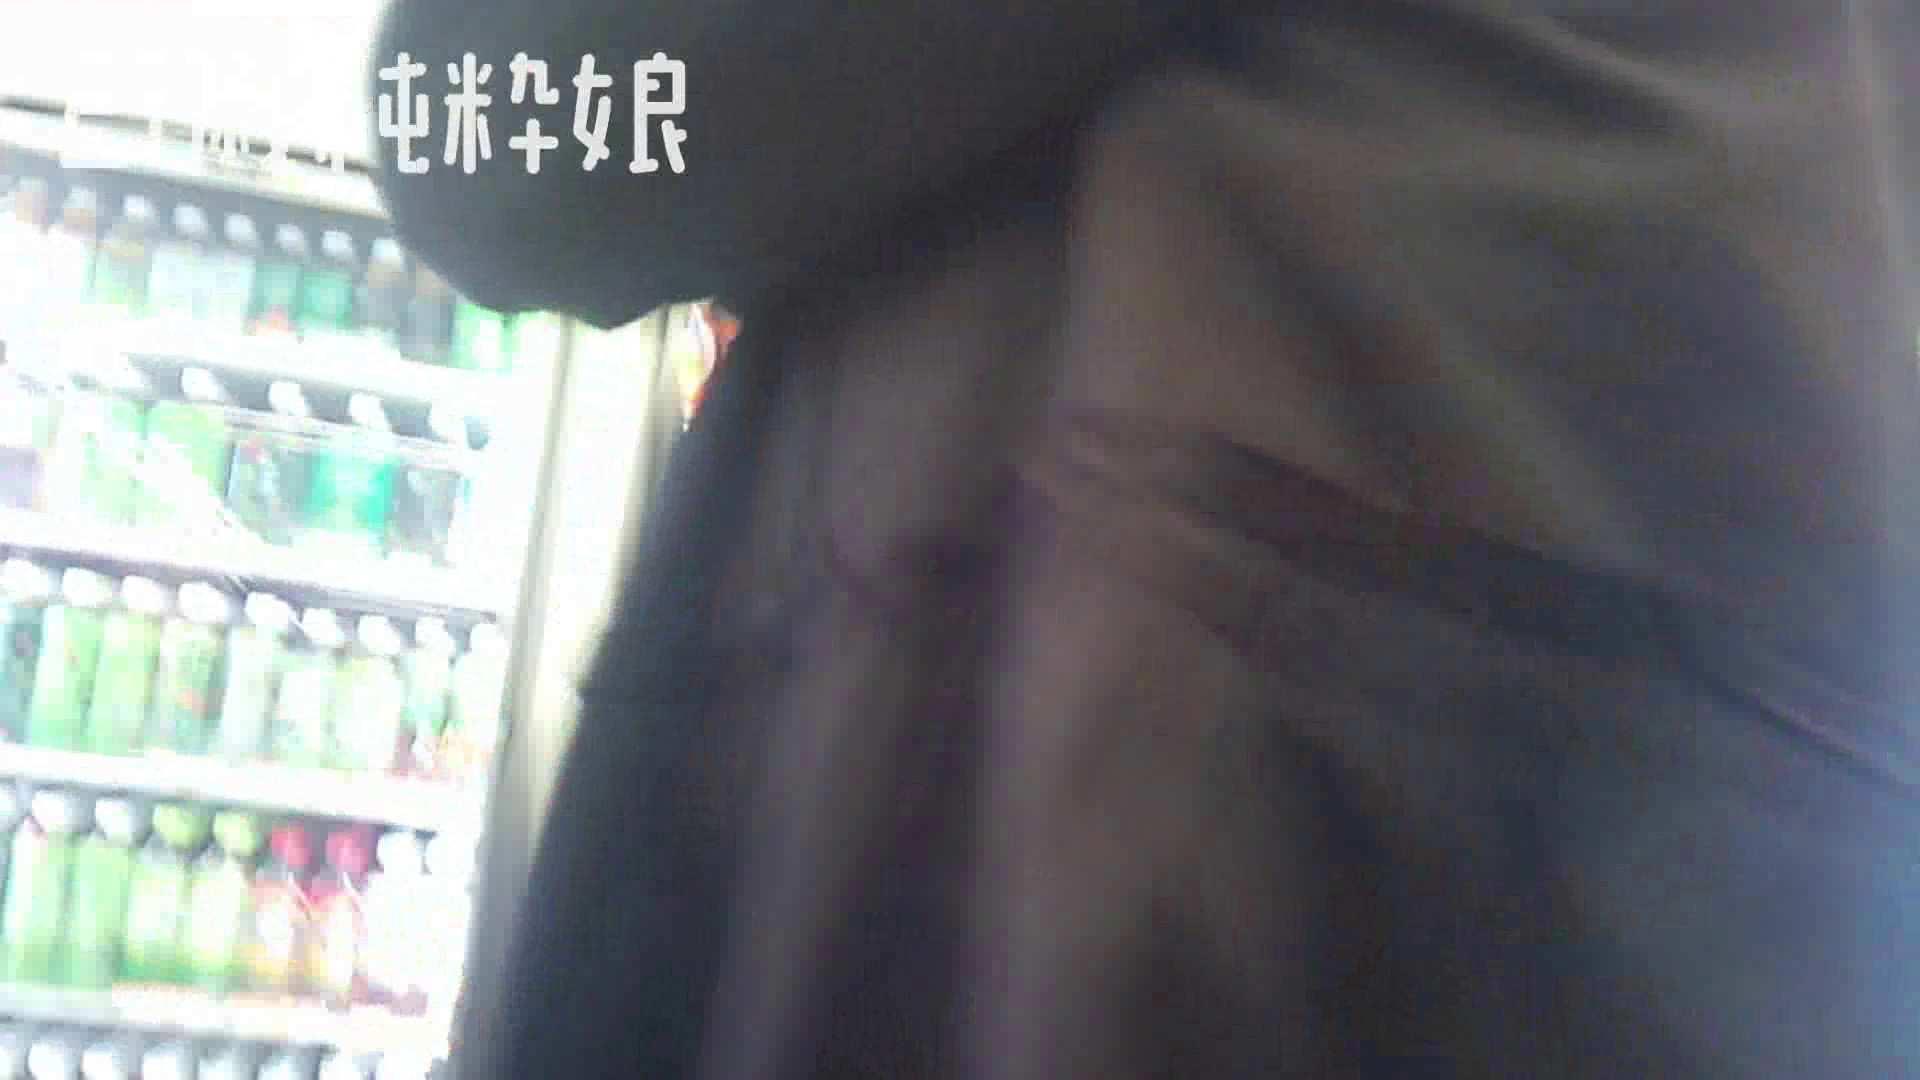 Gカップ21歳純粋嬢第2弾Vol.5 OLヌード天国 | 学校  110PIX 11